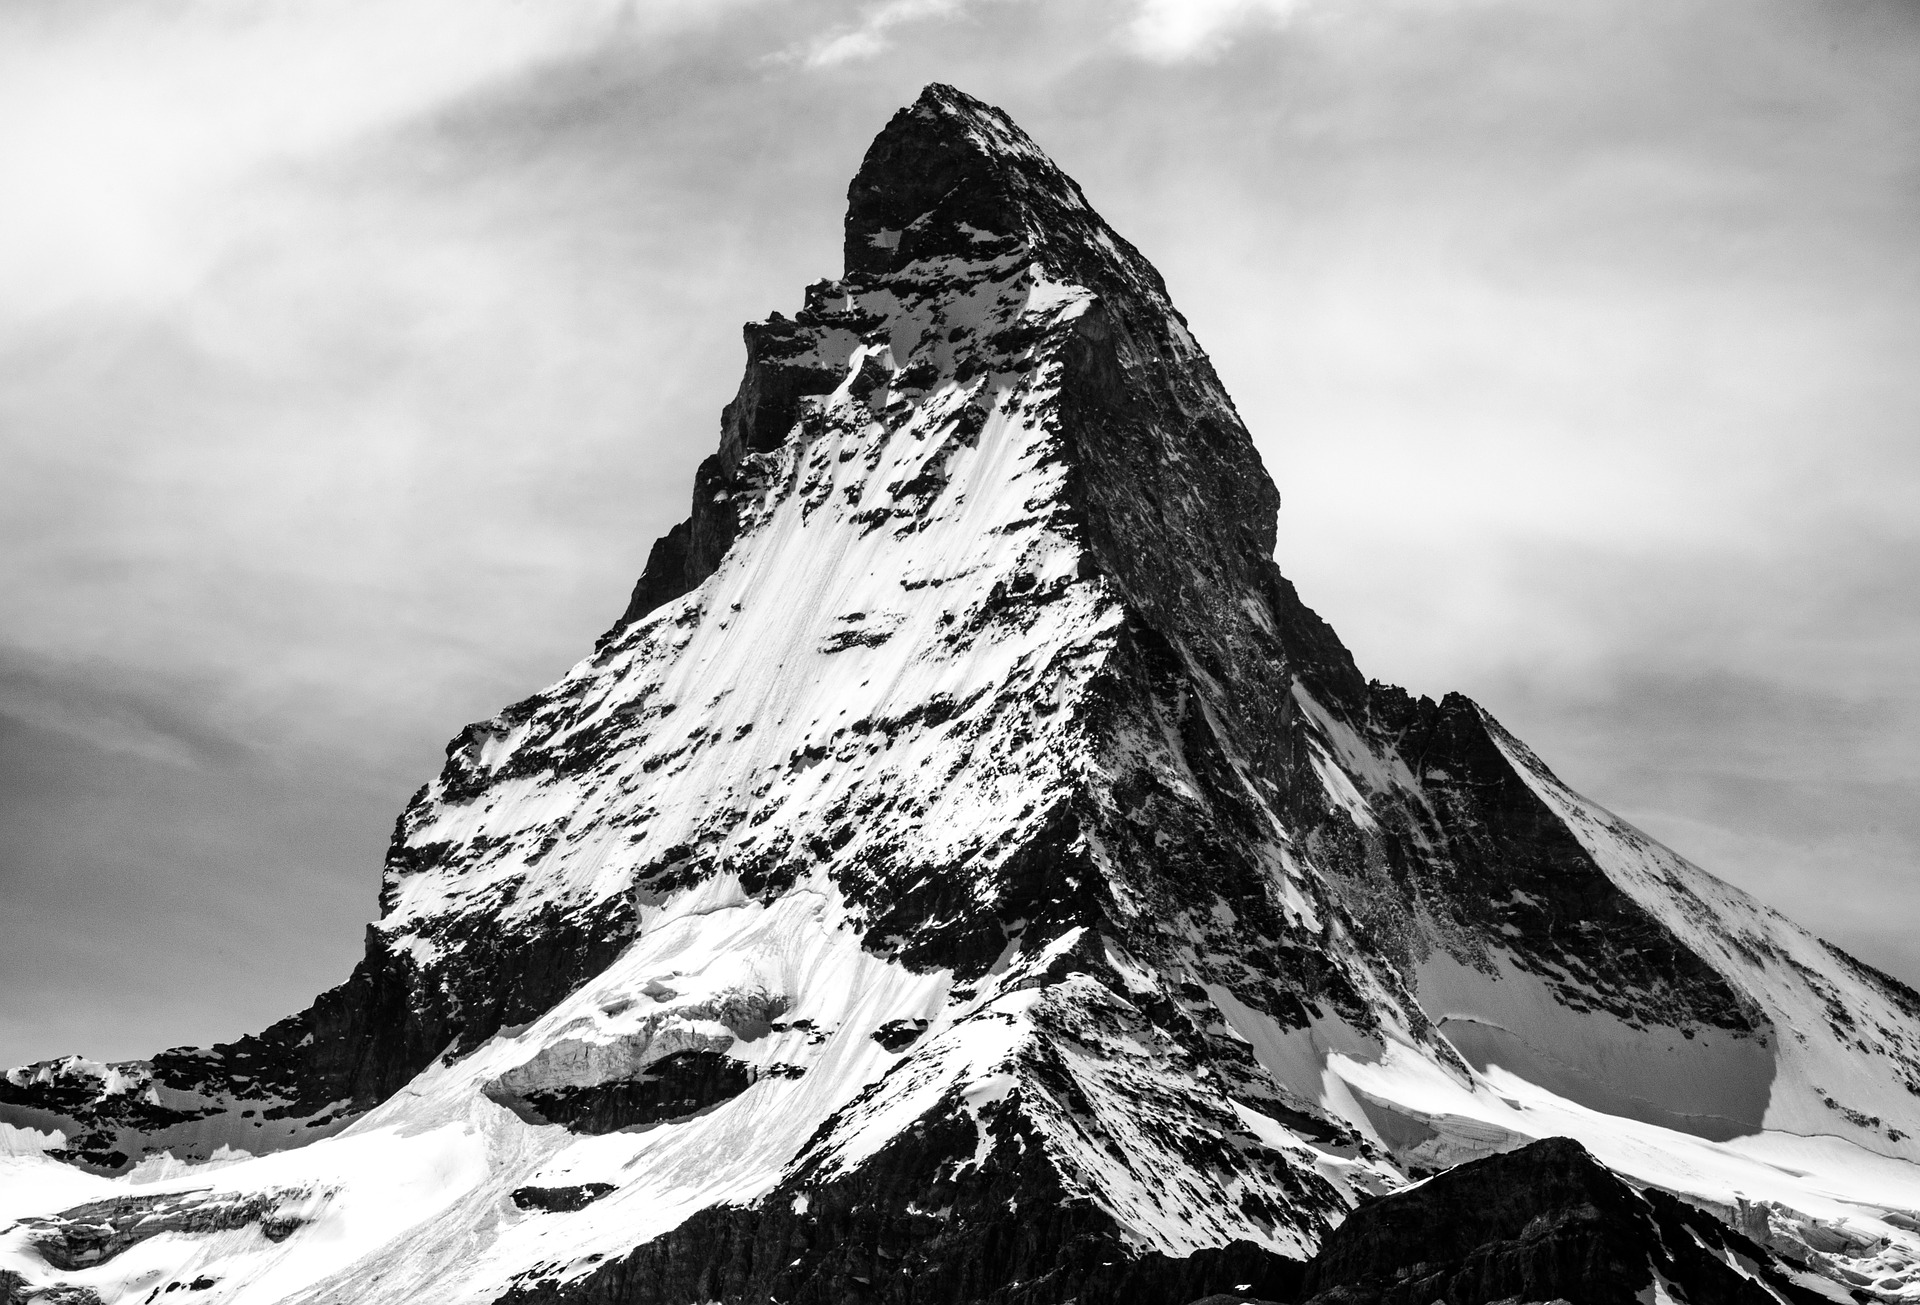 Ingolf Derkow und das Bergwandern Alpen Matterhorn-918442_1920